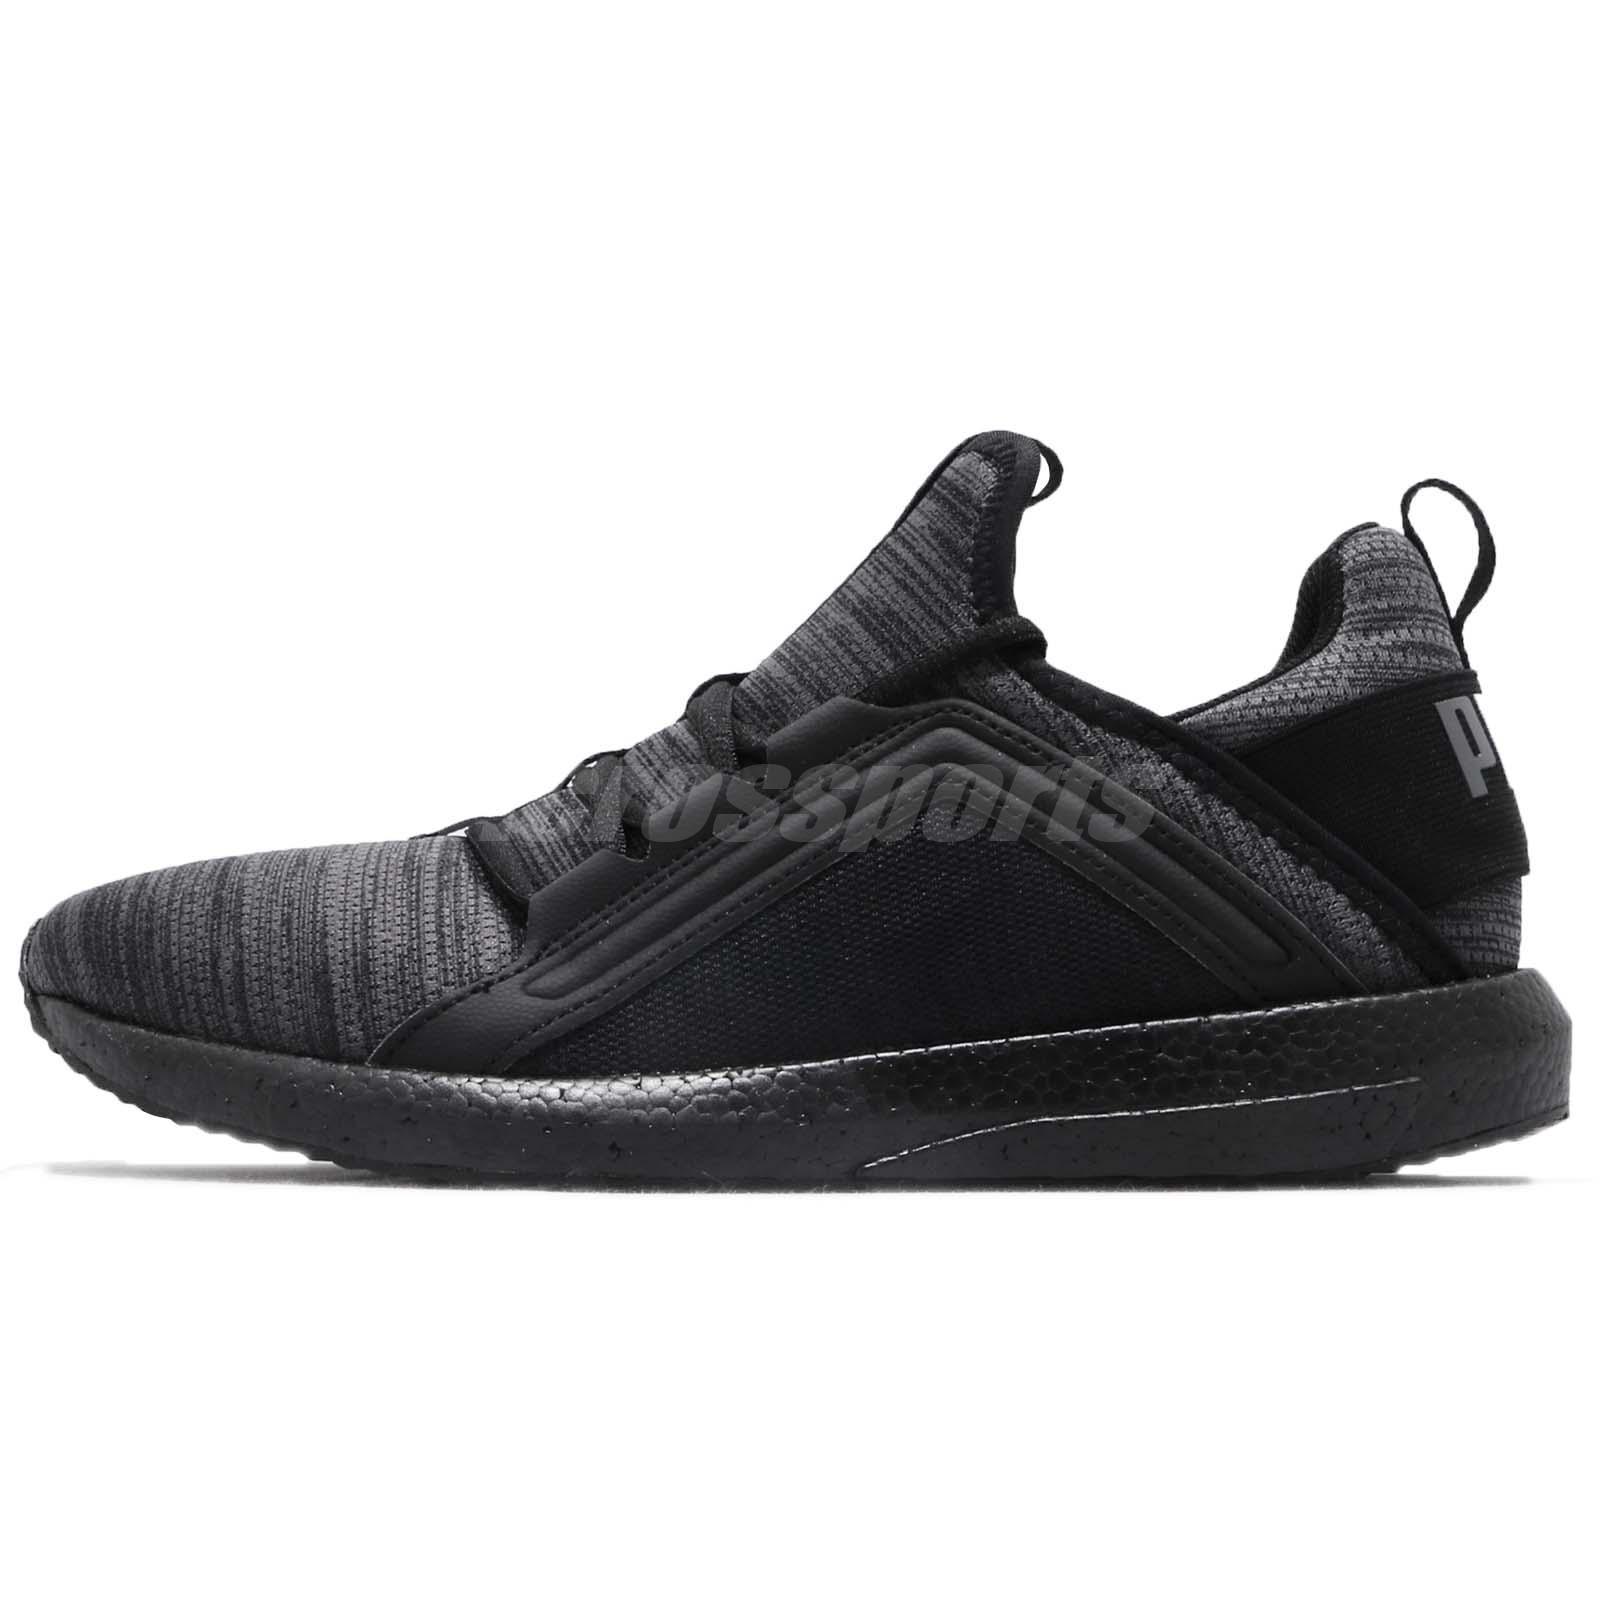 c42208268fc Puma Mega NRGY Heather Knit Black Grey Men Running Shoes Sneakers 191095-06